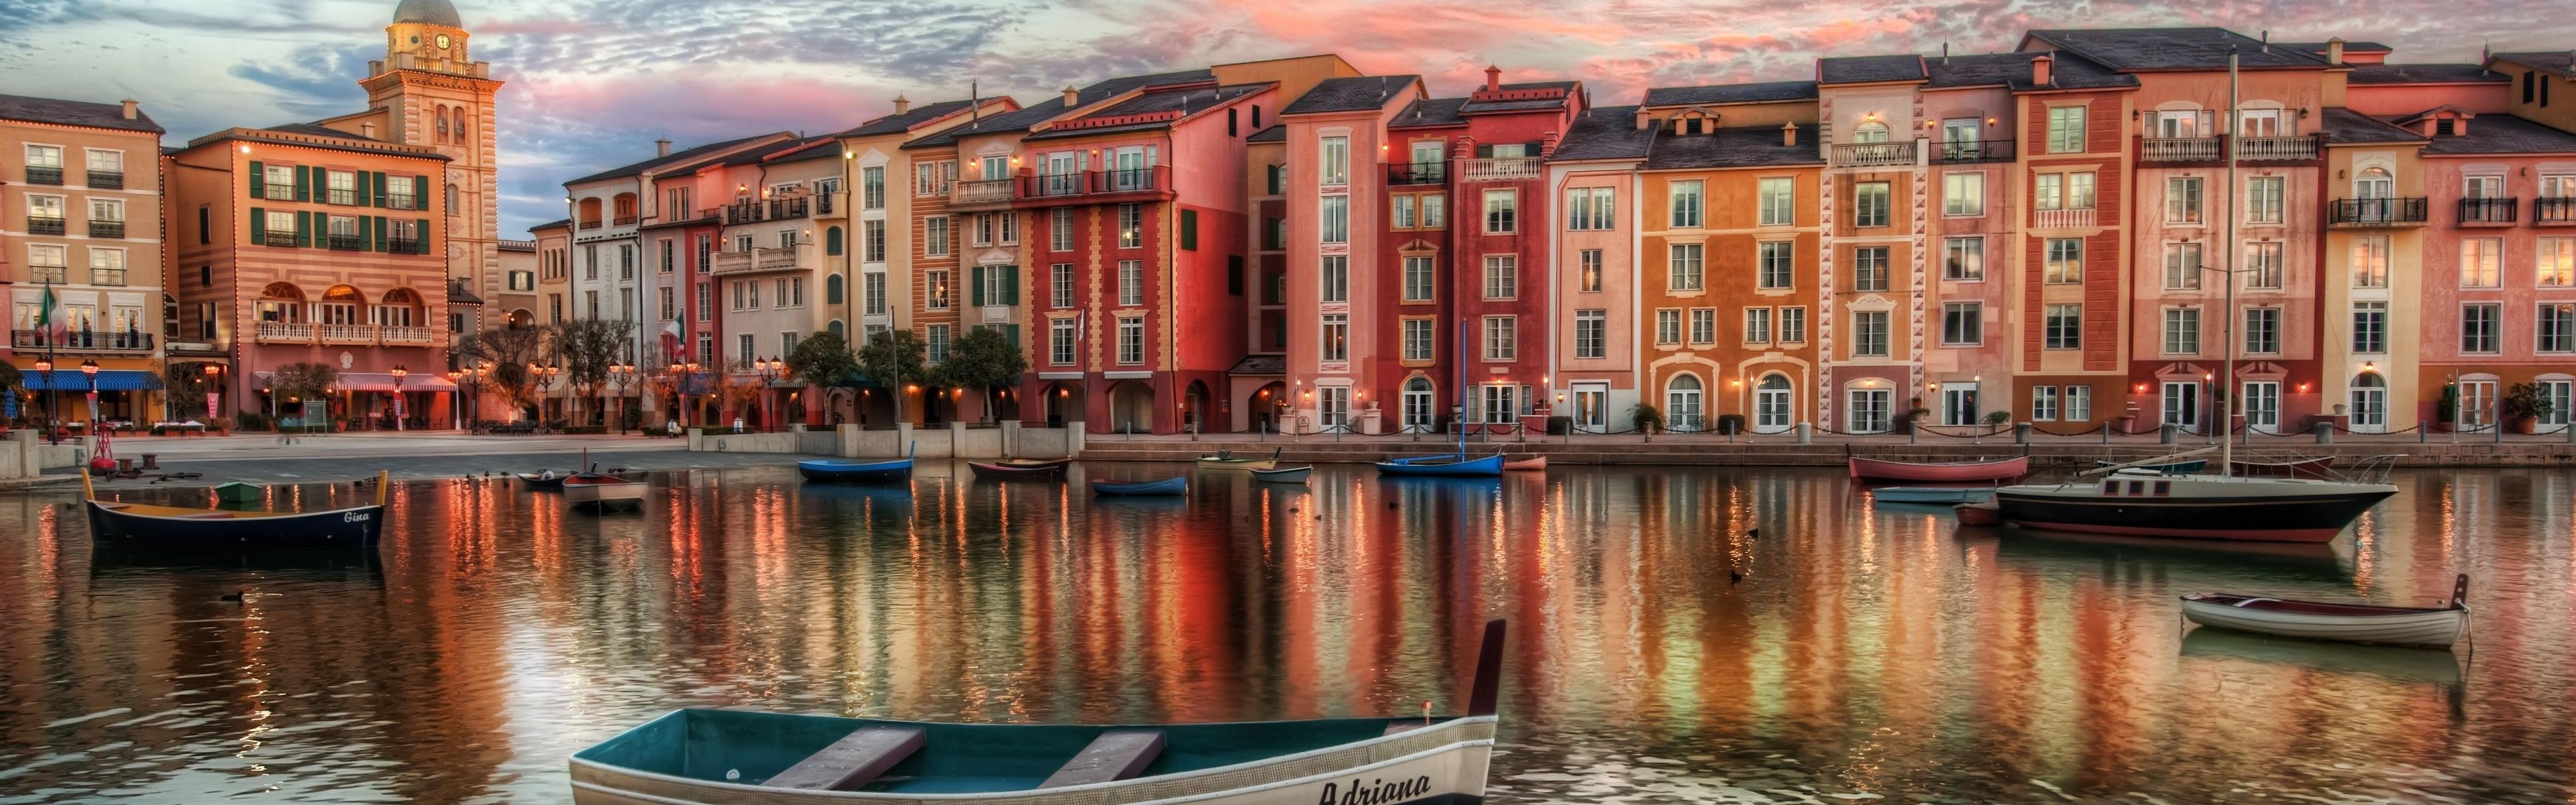 Adriana-Boat-iphone-panoramic-wallpaper-ilikewallpaper_com